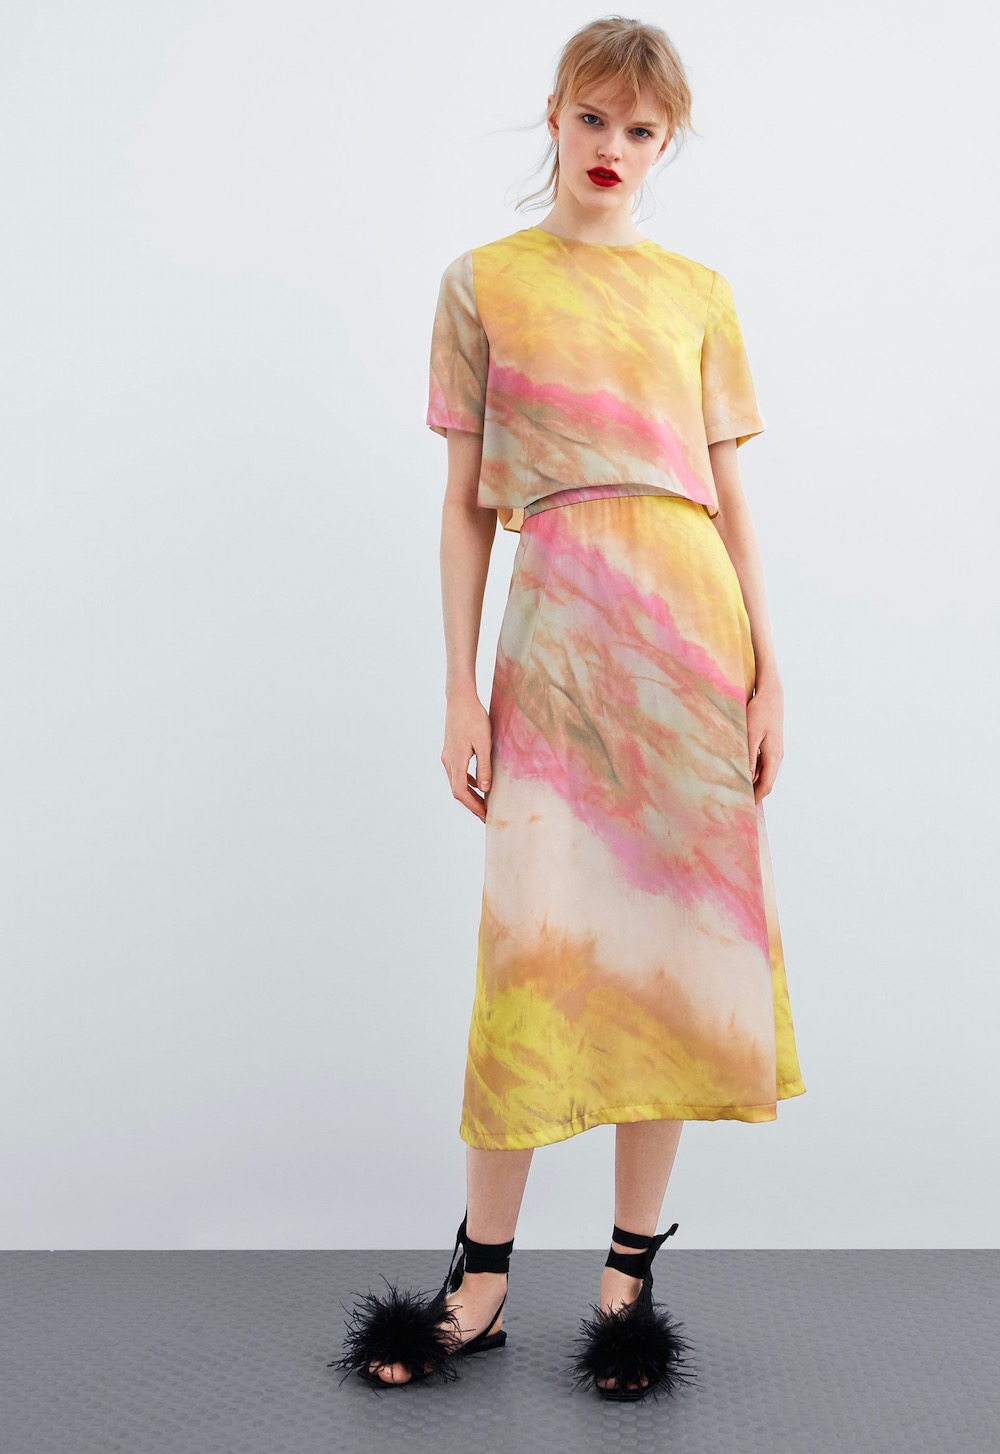 Zara  27 Midi Skirts You Need in Your Closet ASAP Zara Tie Dye